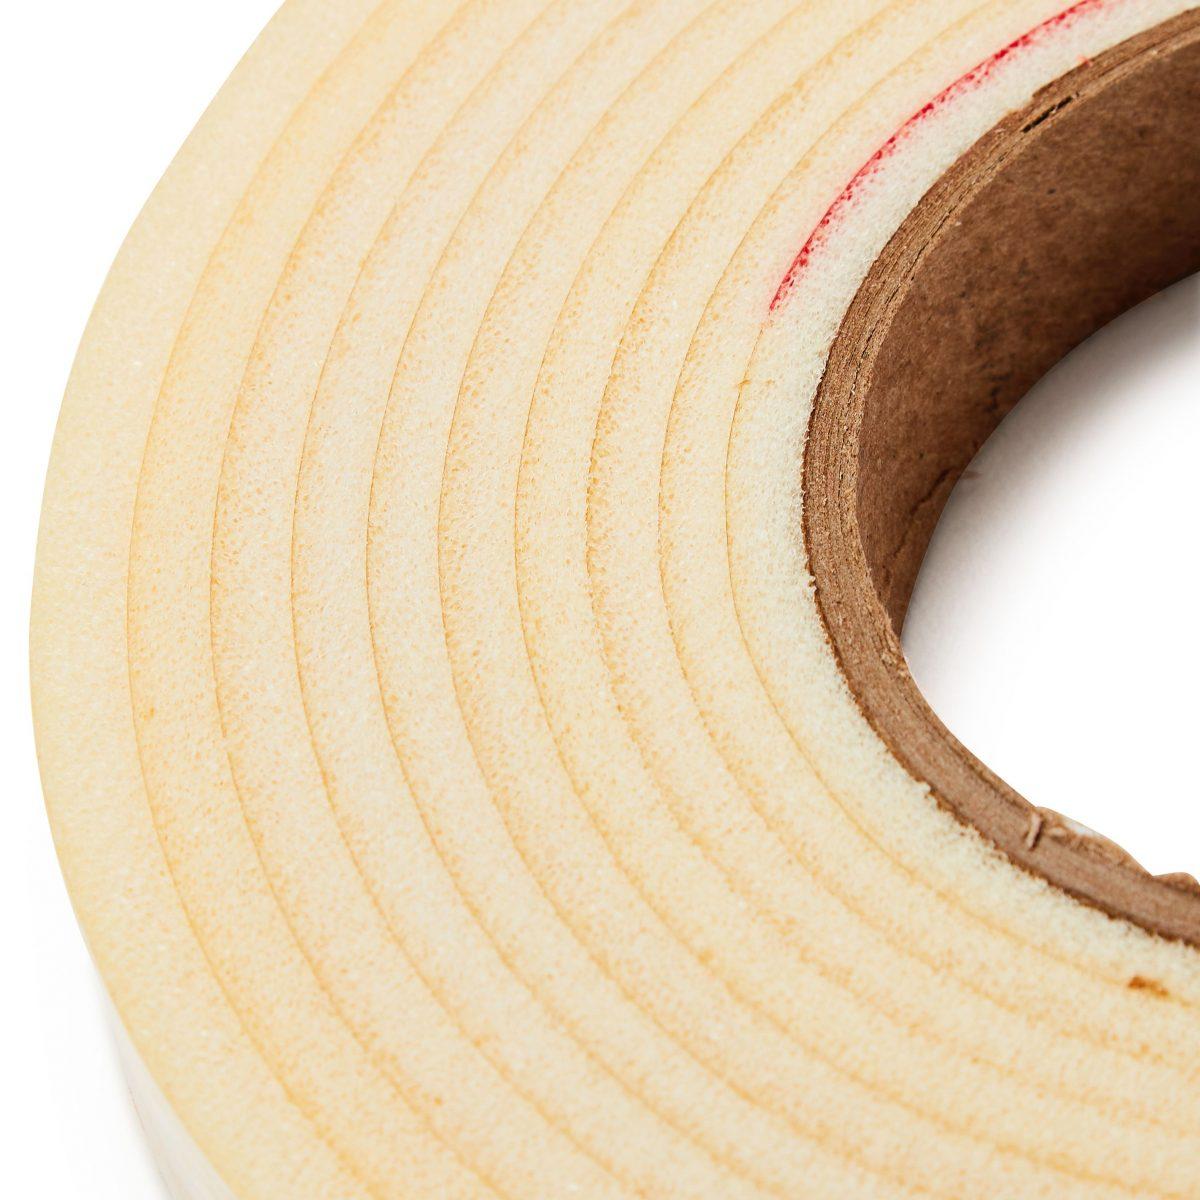 Padded Tape